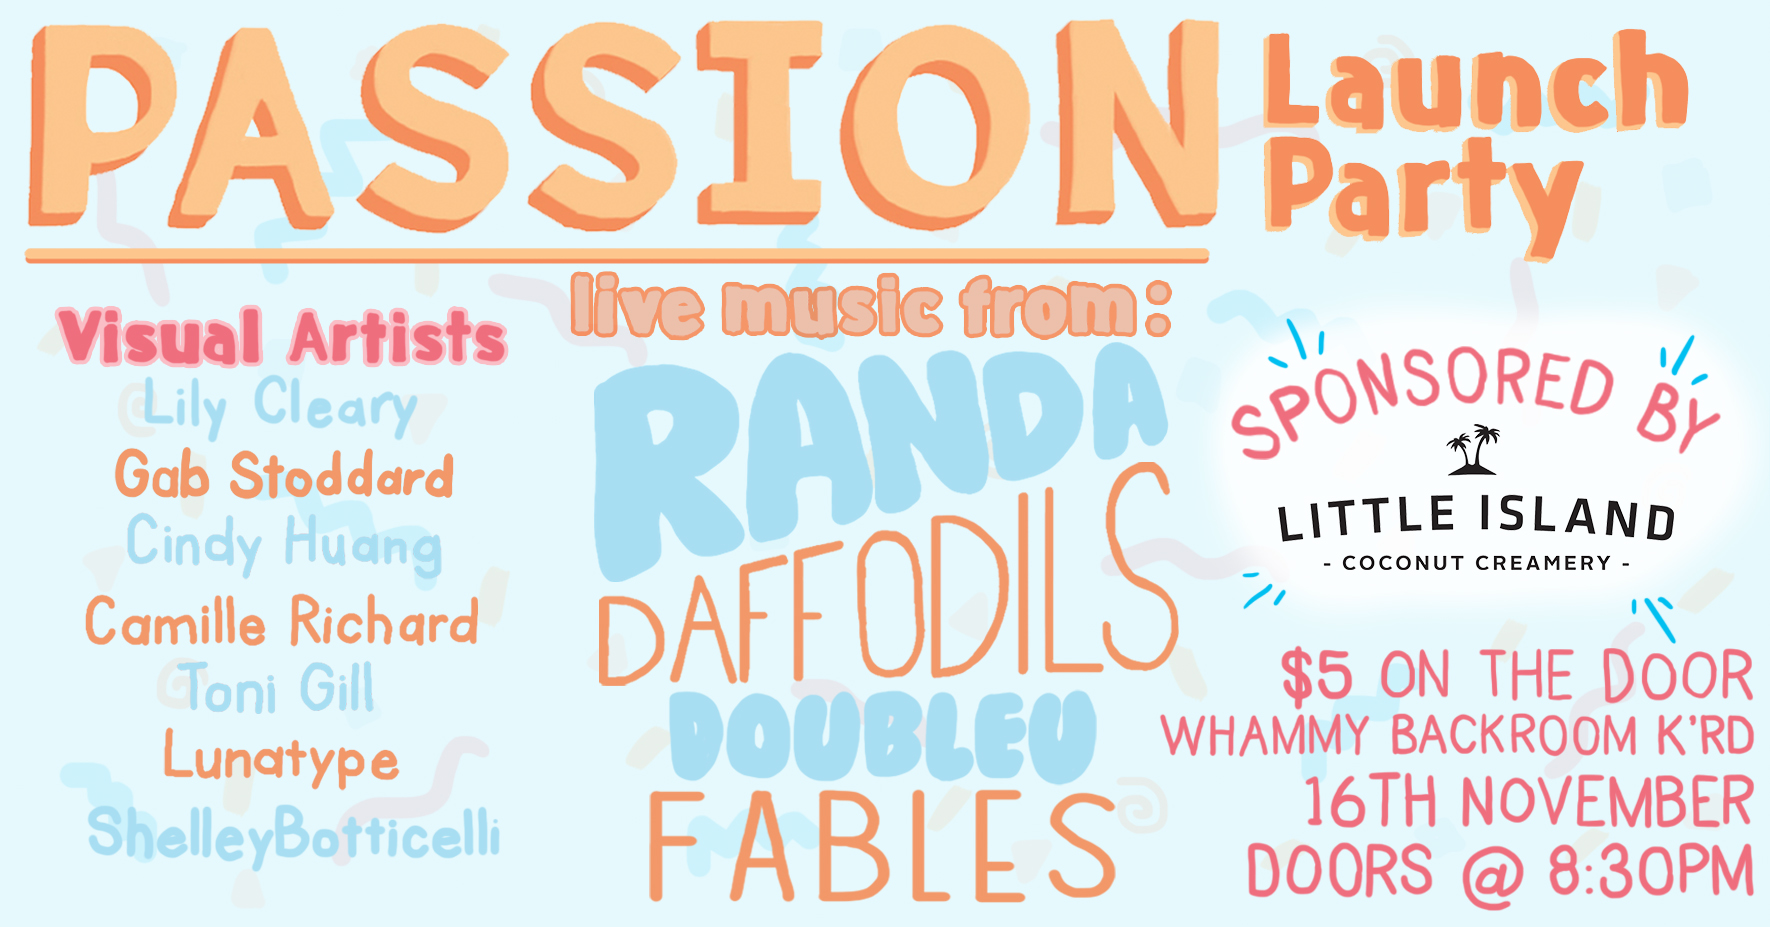 Passion Launch Party - Randa, Daffodils, Doubleu, Fables